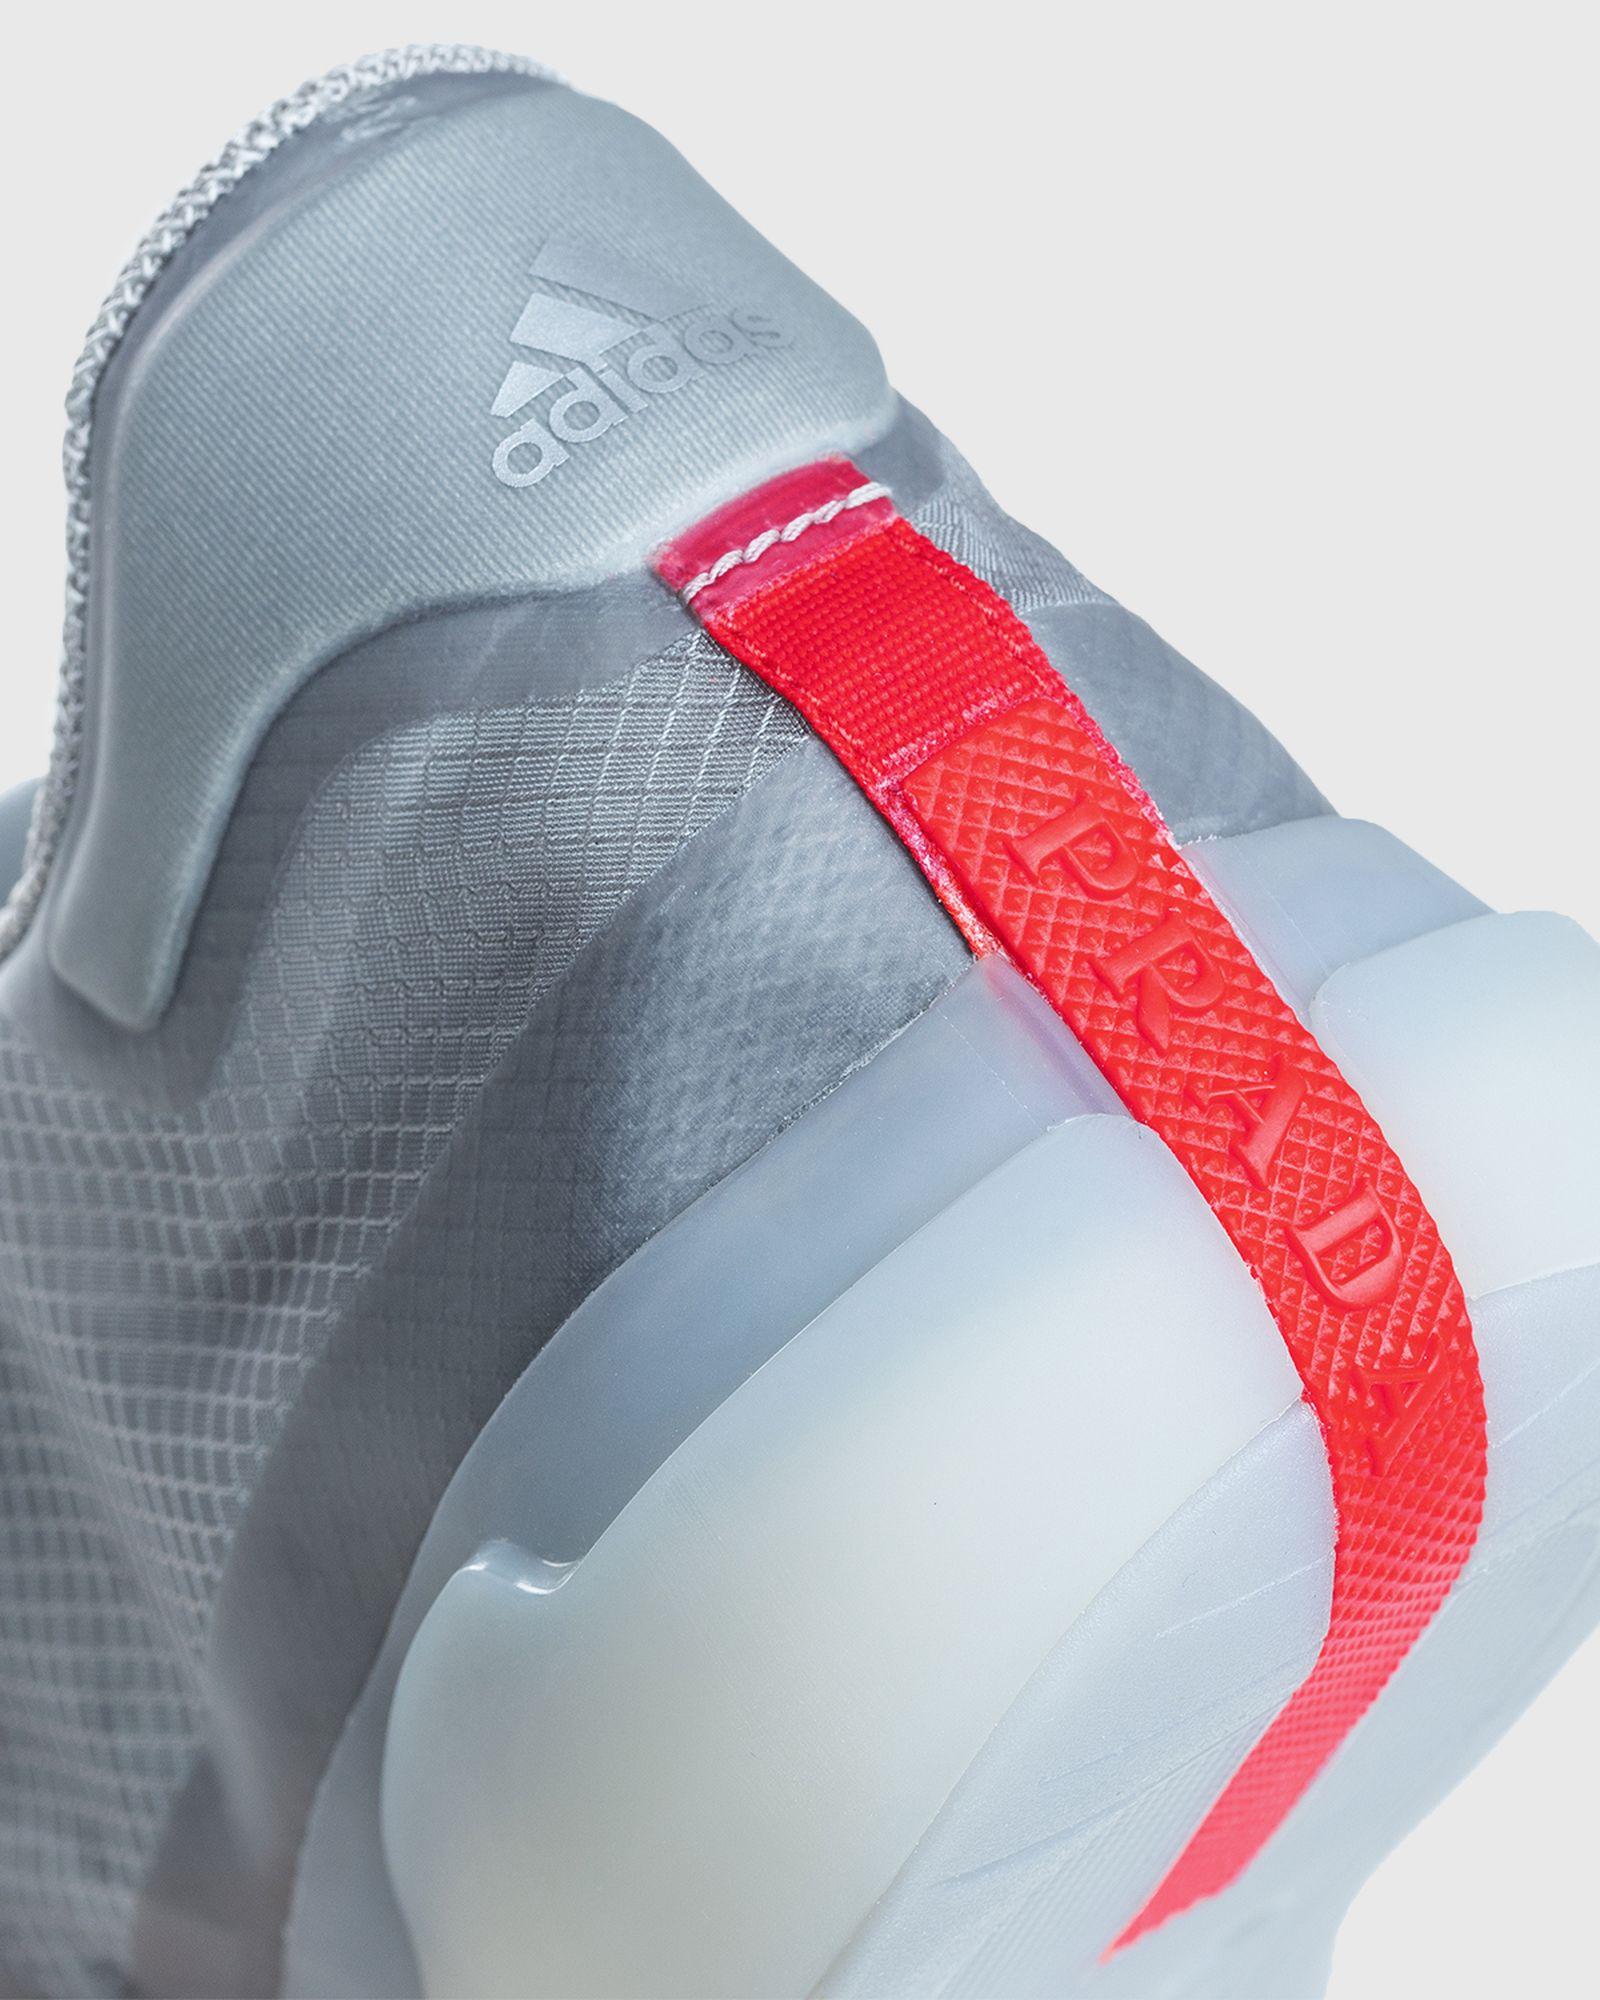 adidas-prada-luna-rossa-replica-grey-release-date-price-main